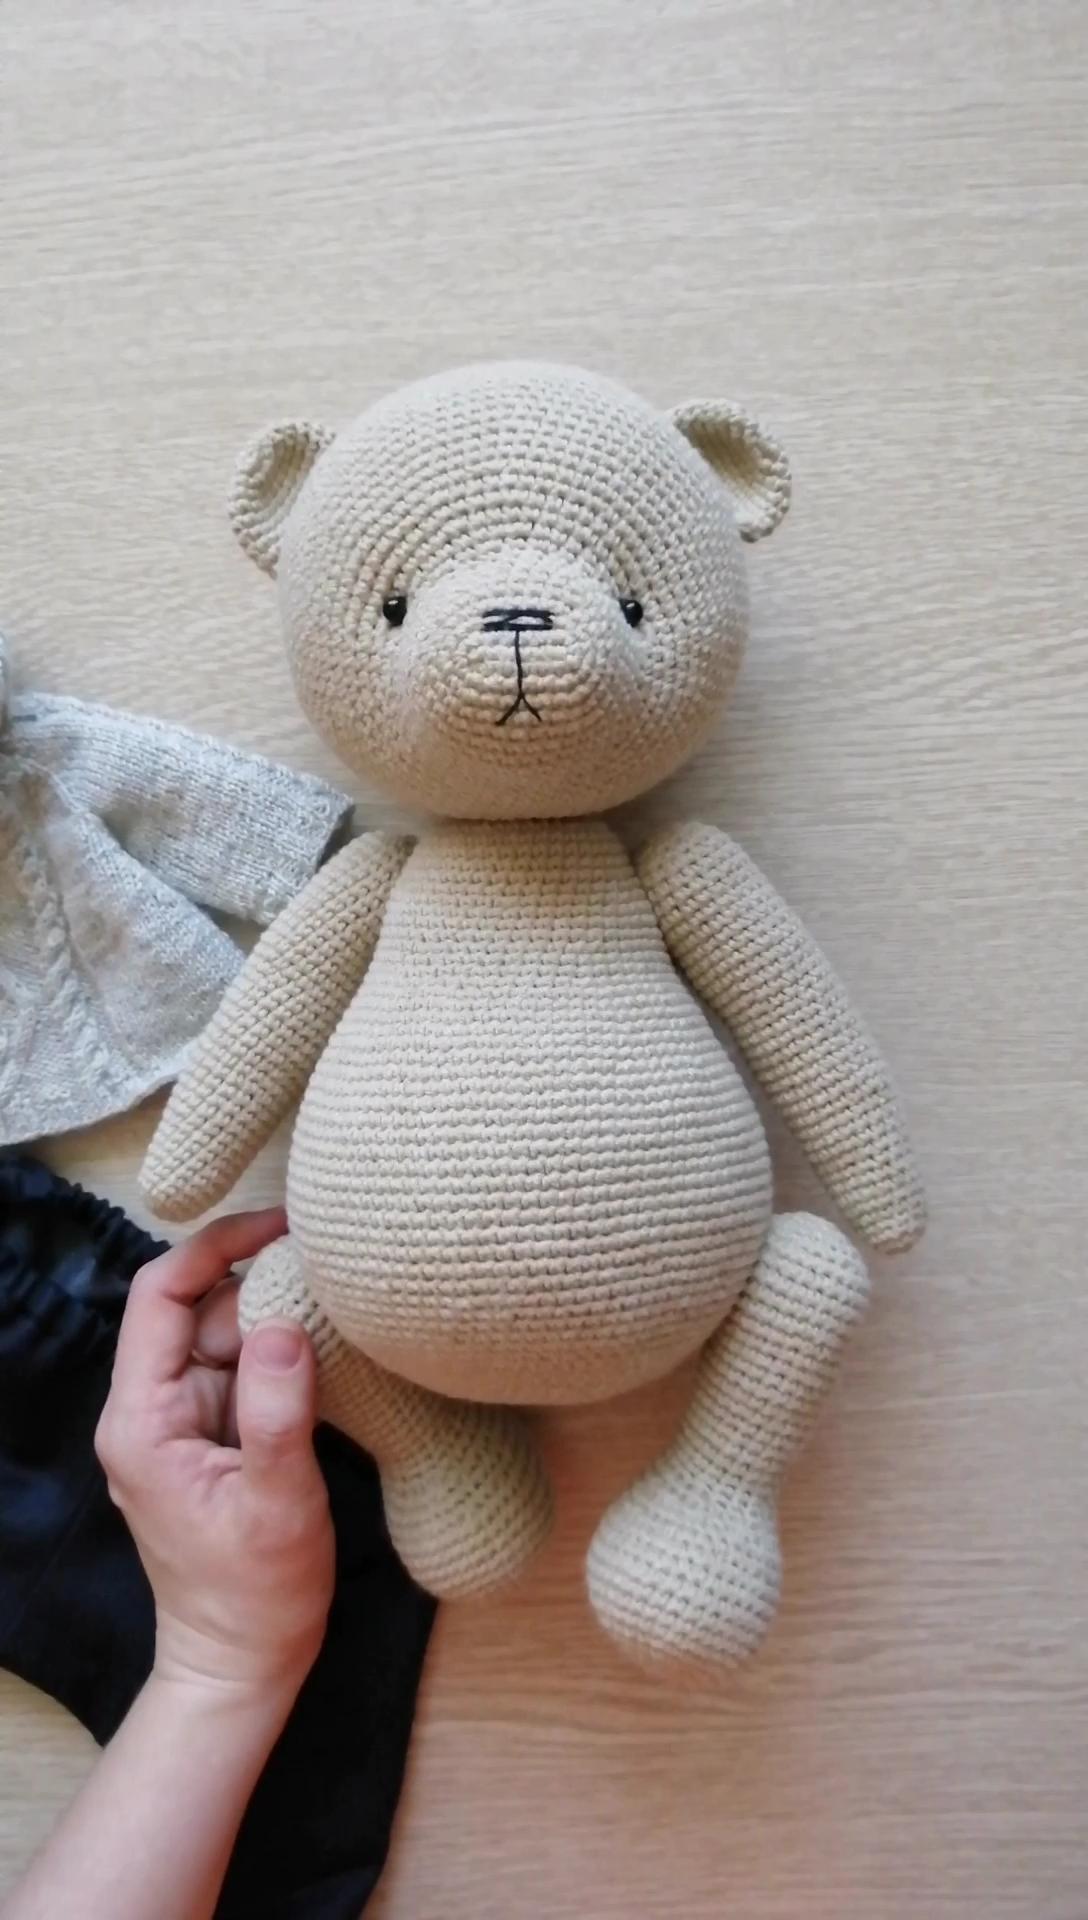 Crochet Bear PATTERN - Lucas the Teddy - Classic Teddy Bear ... | 1920x1088